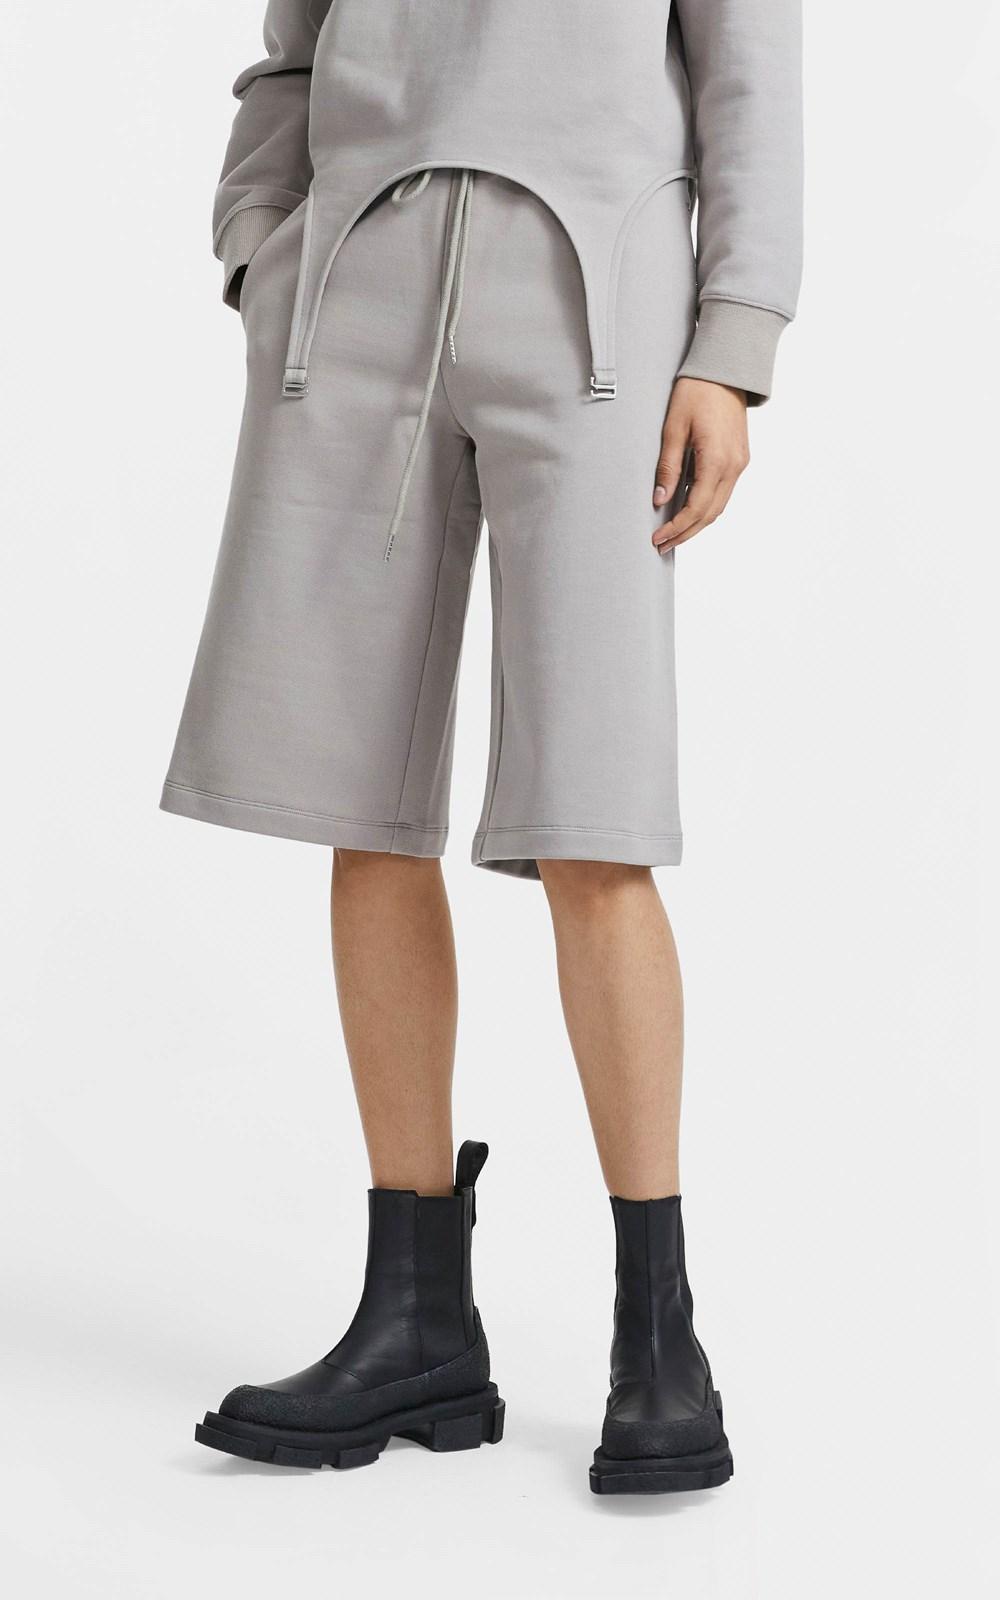 Pants | UTILITY TRACK SHORT